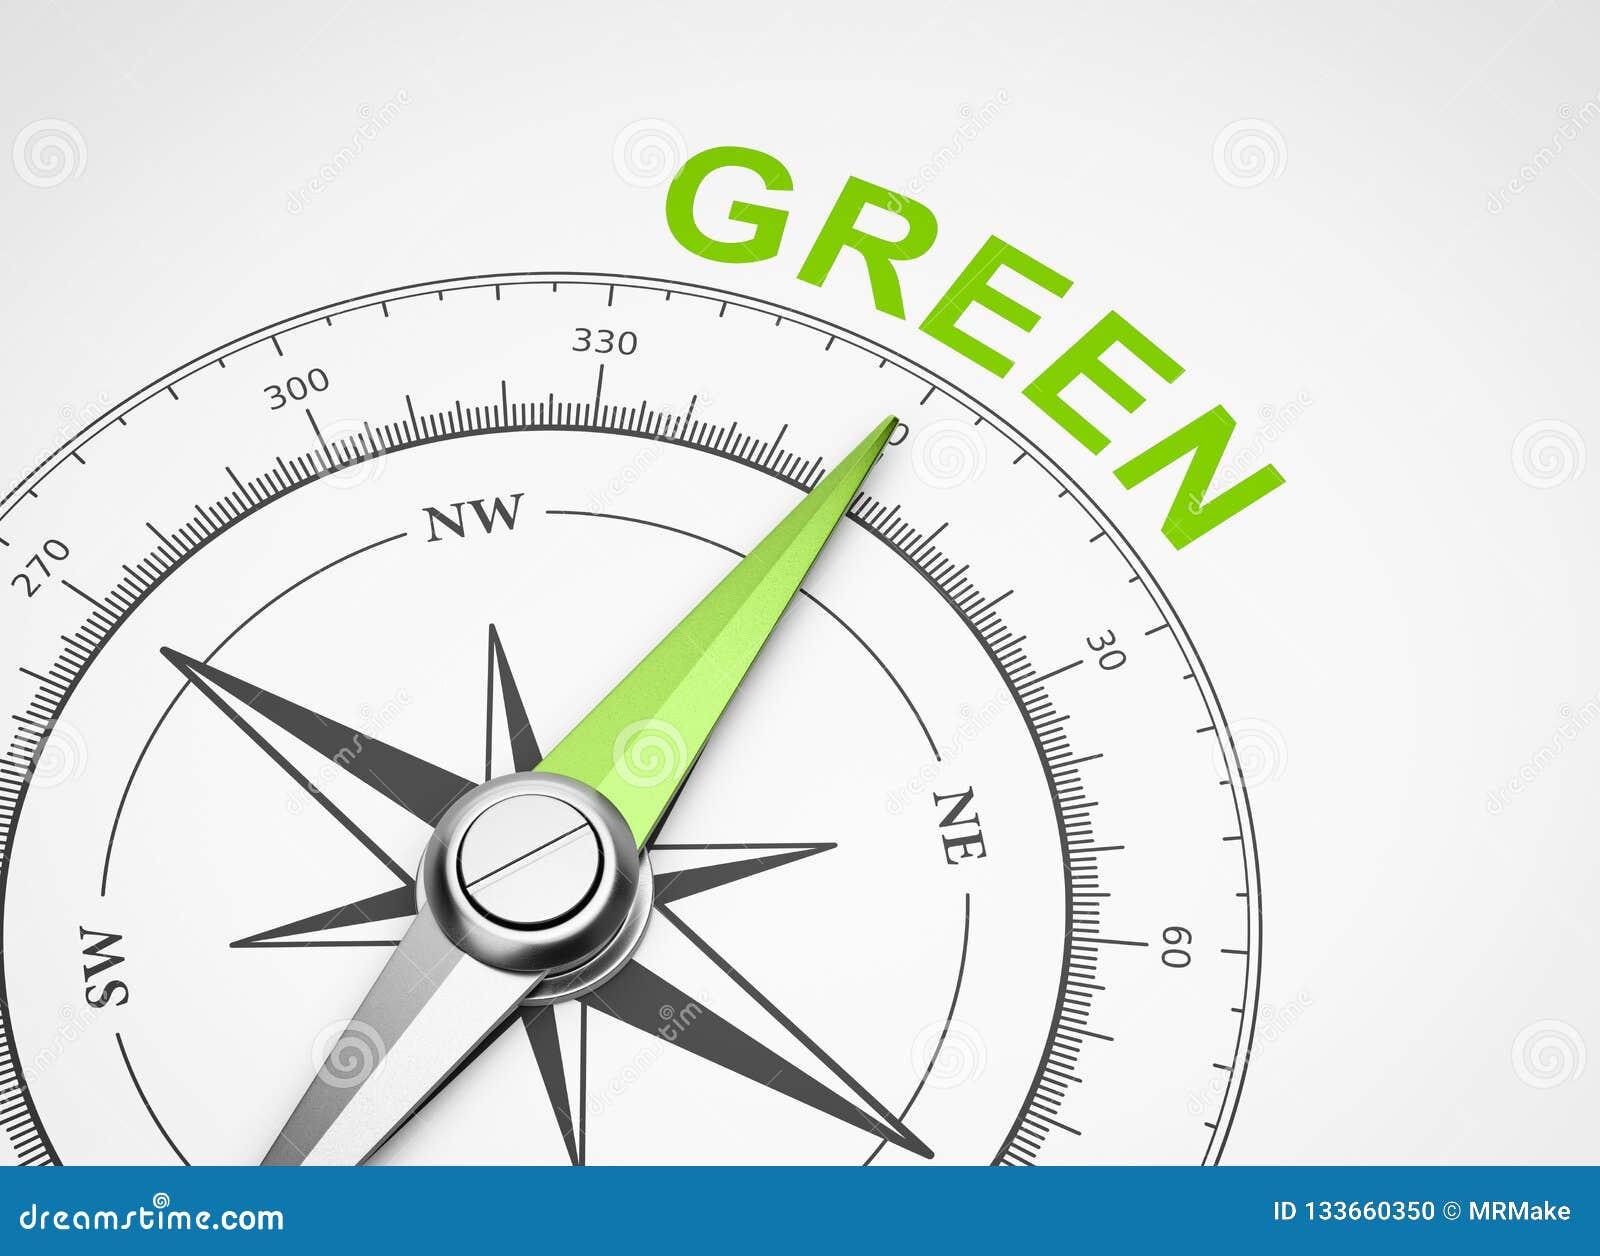 Bussola su fondo bianco, concetto verde